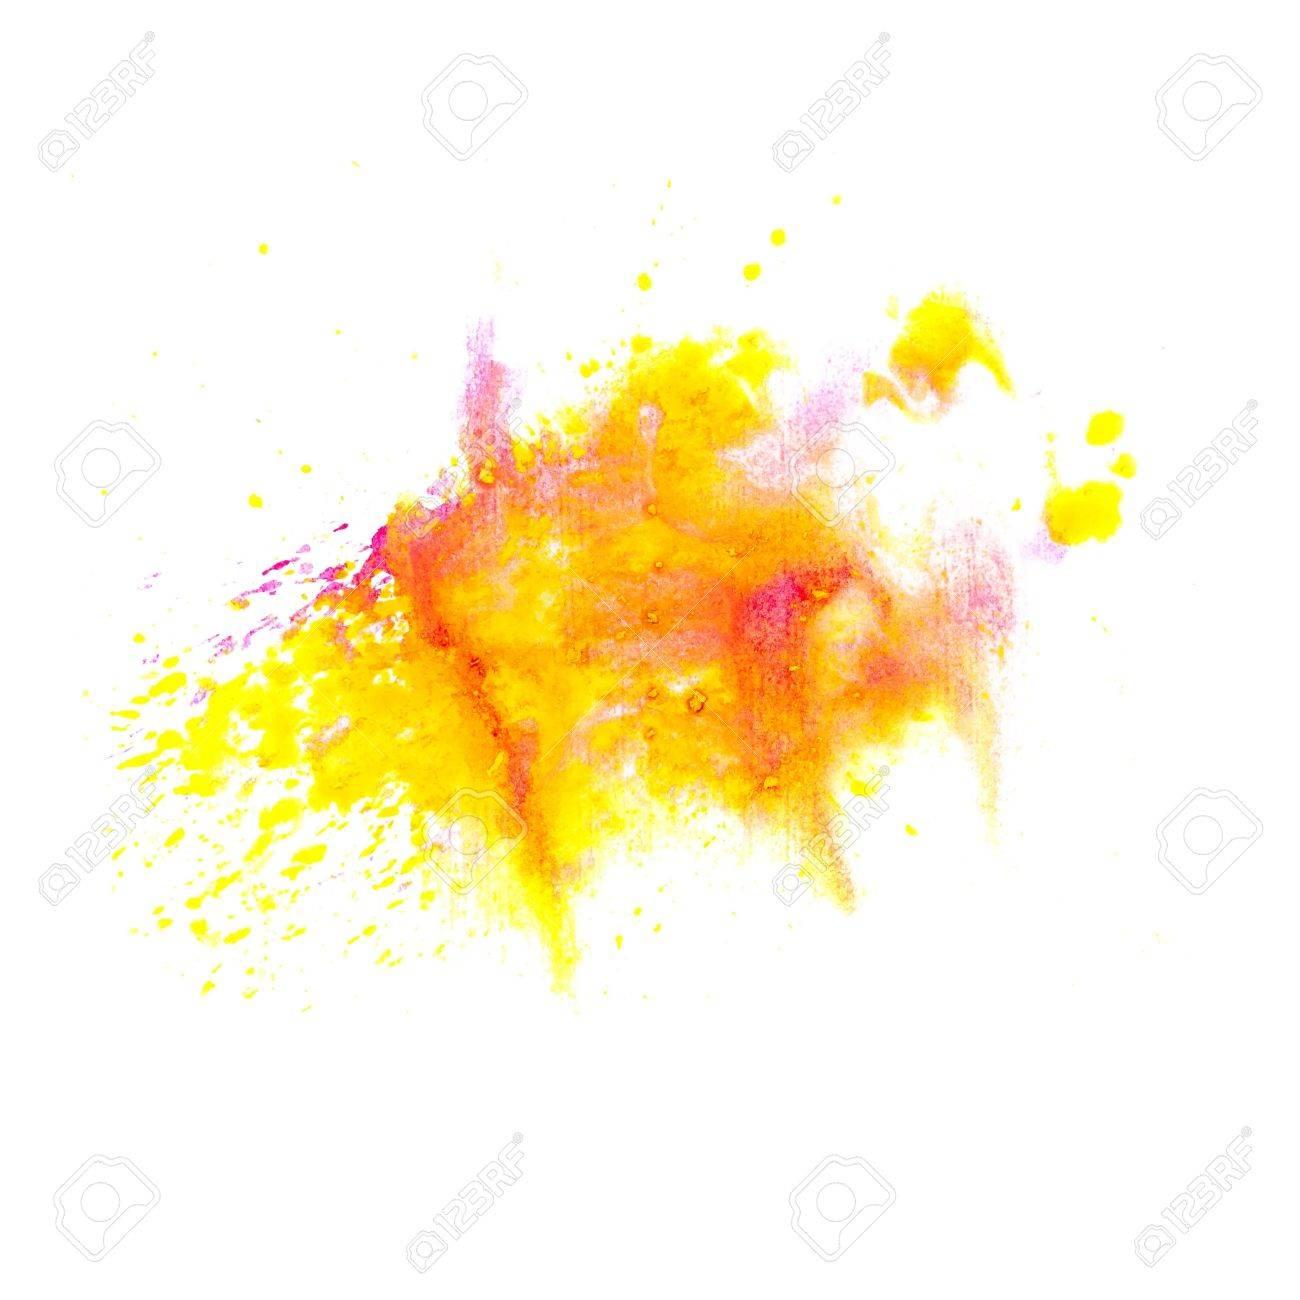 orange yellow macro spot blotch texture isolated on a white background Stock Photo - 16861700